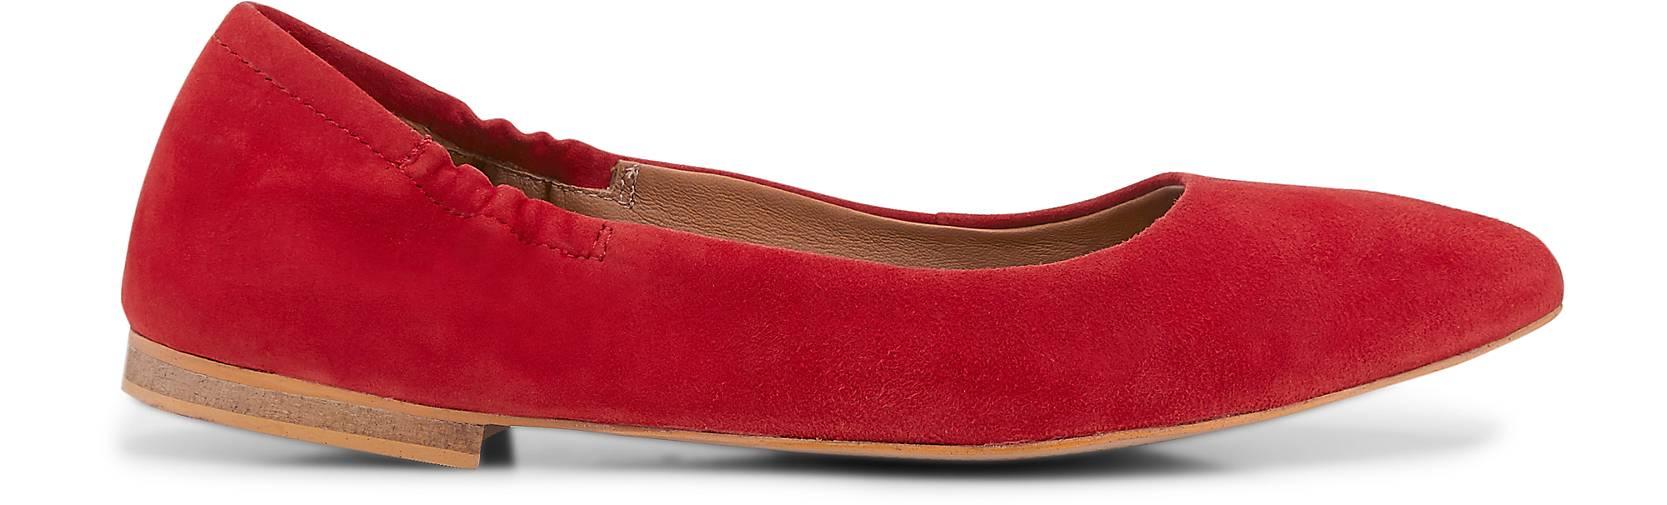 Cox Stretch-Ballerina Stretch-Ballerina Stretch-Ballerina in rot kaufen - 46558908 GÖRTZ Gute Qualität beliebte Schuhe d16fd8